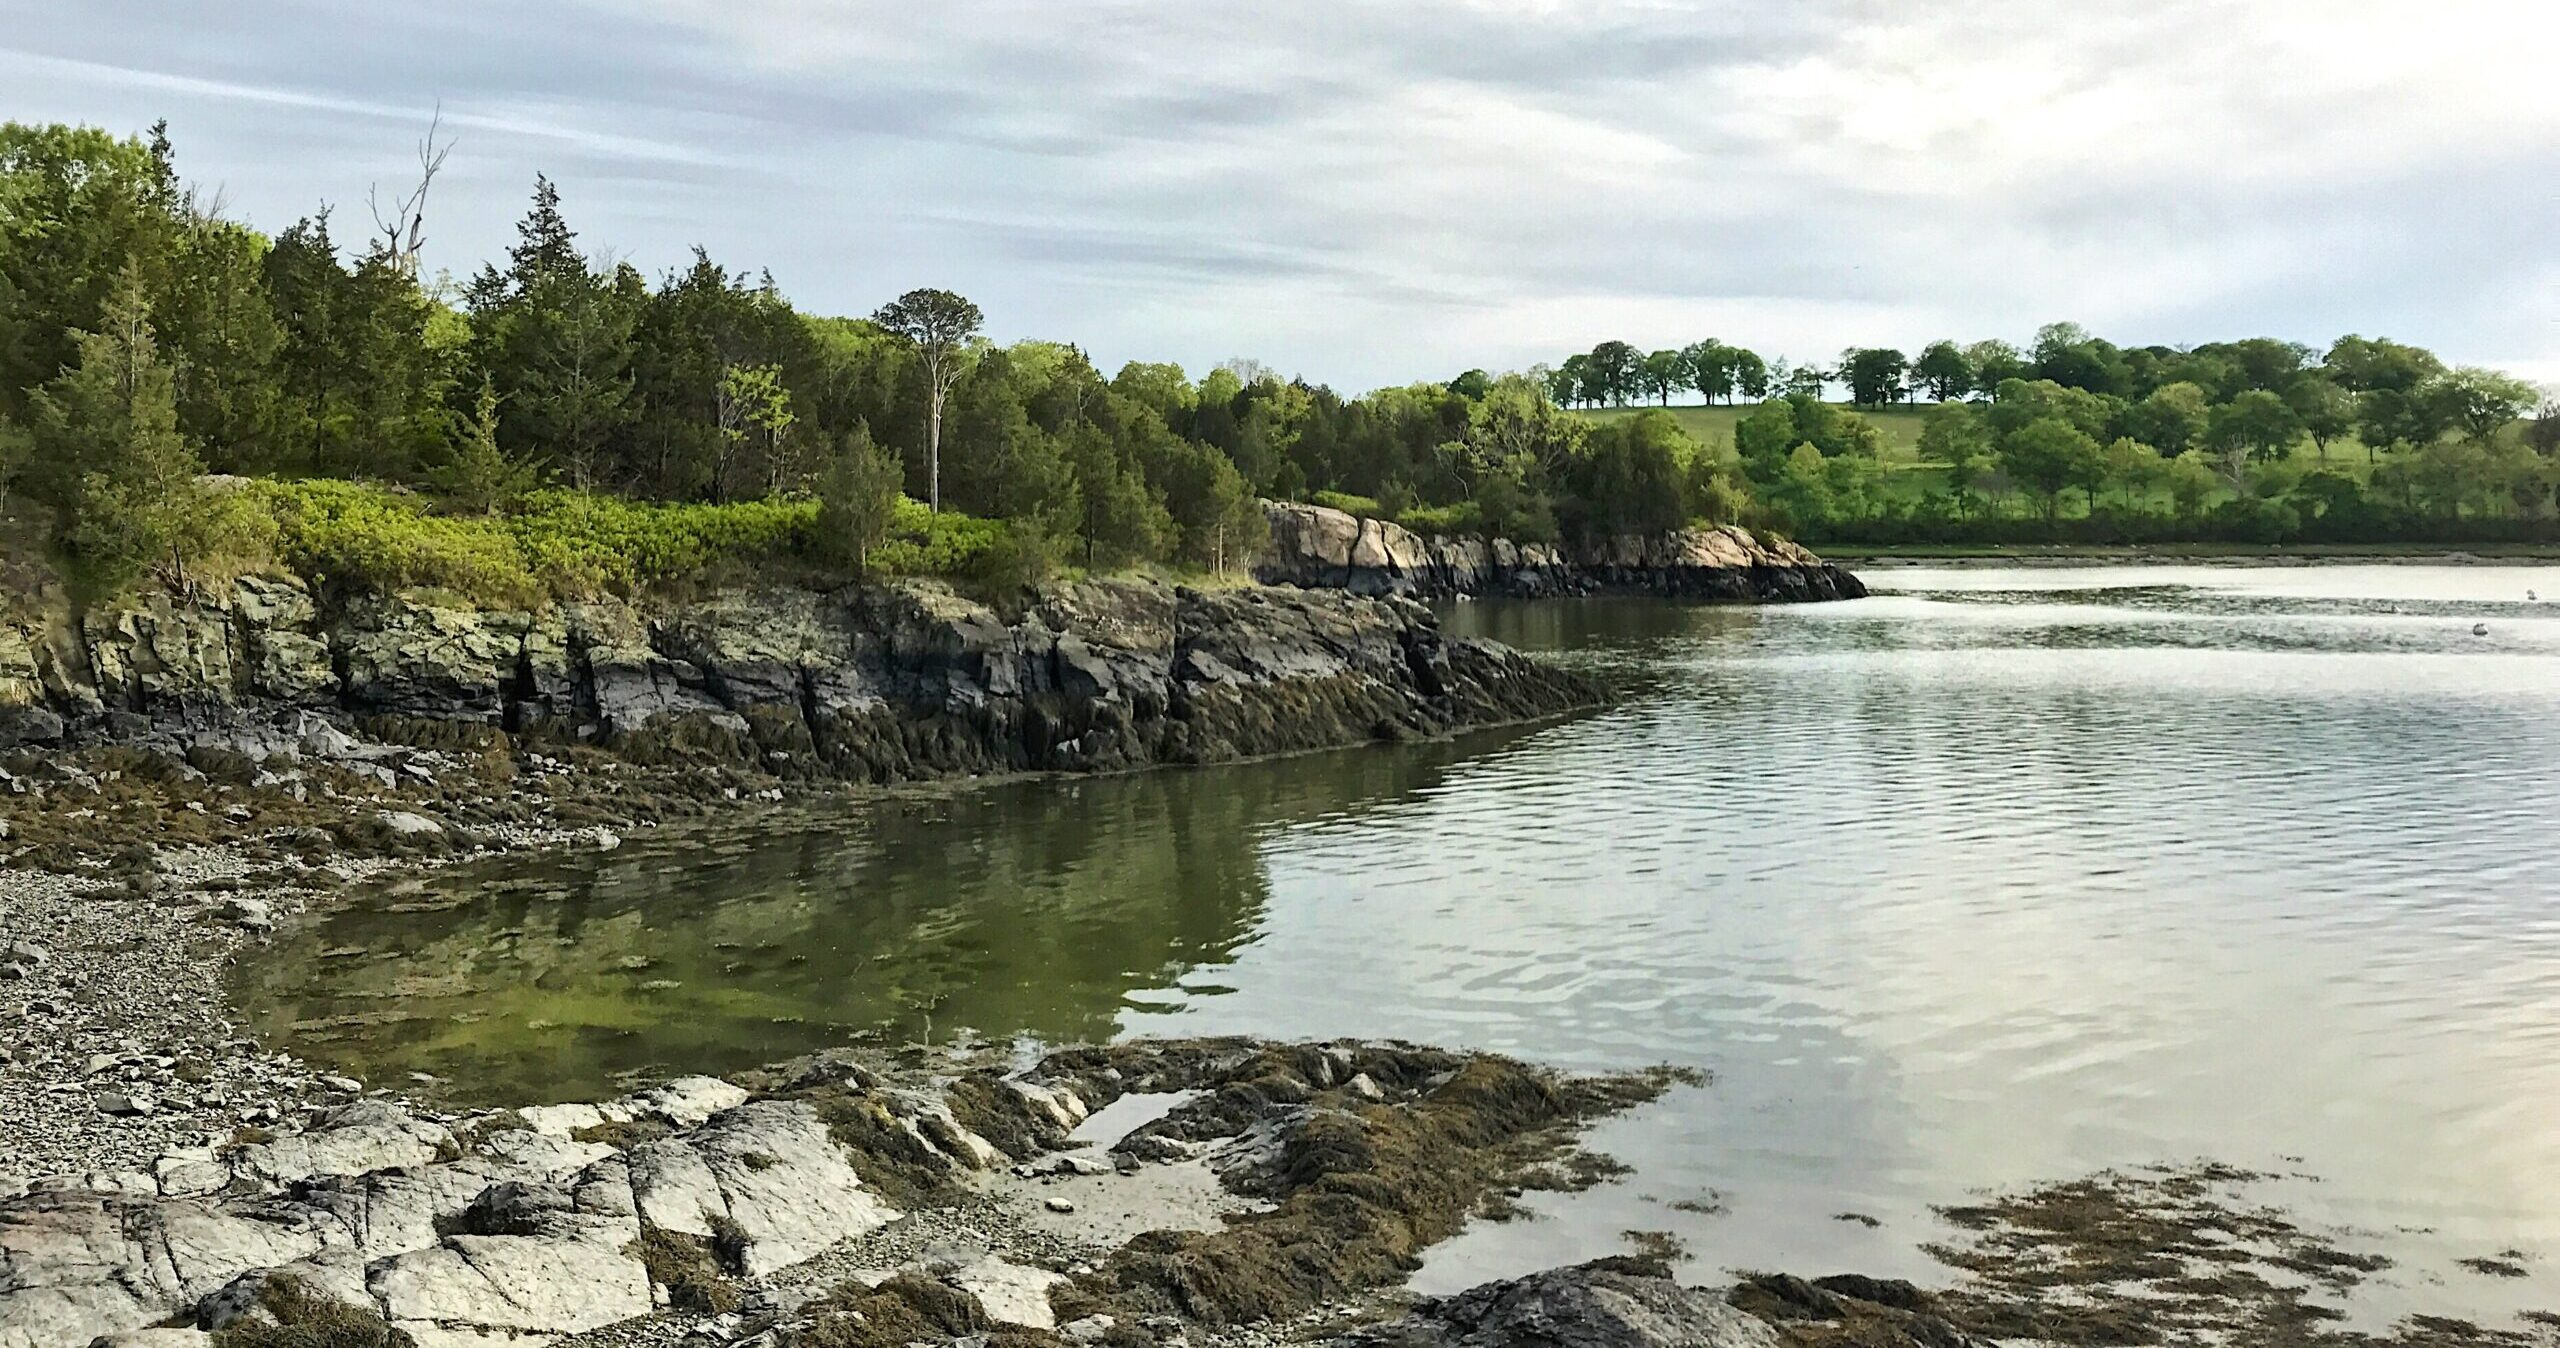 World's End shoreline